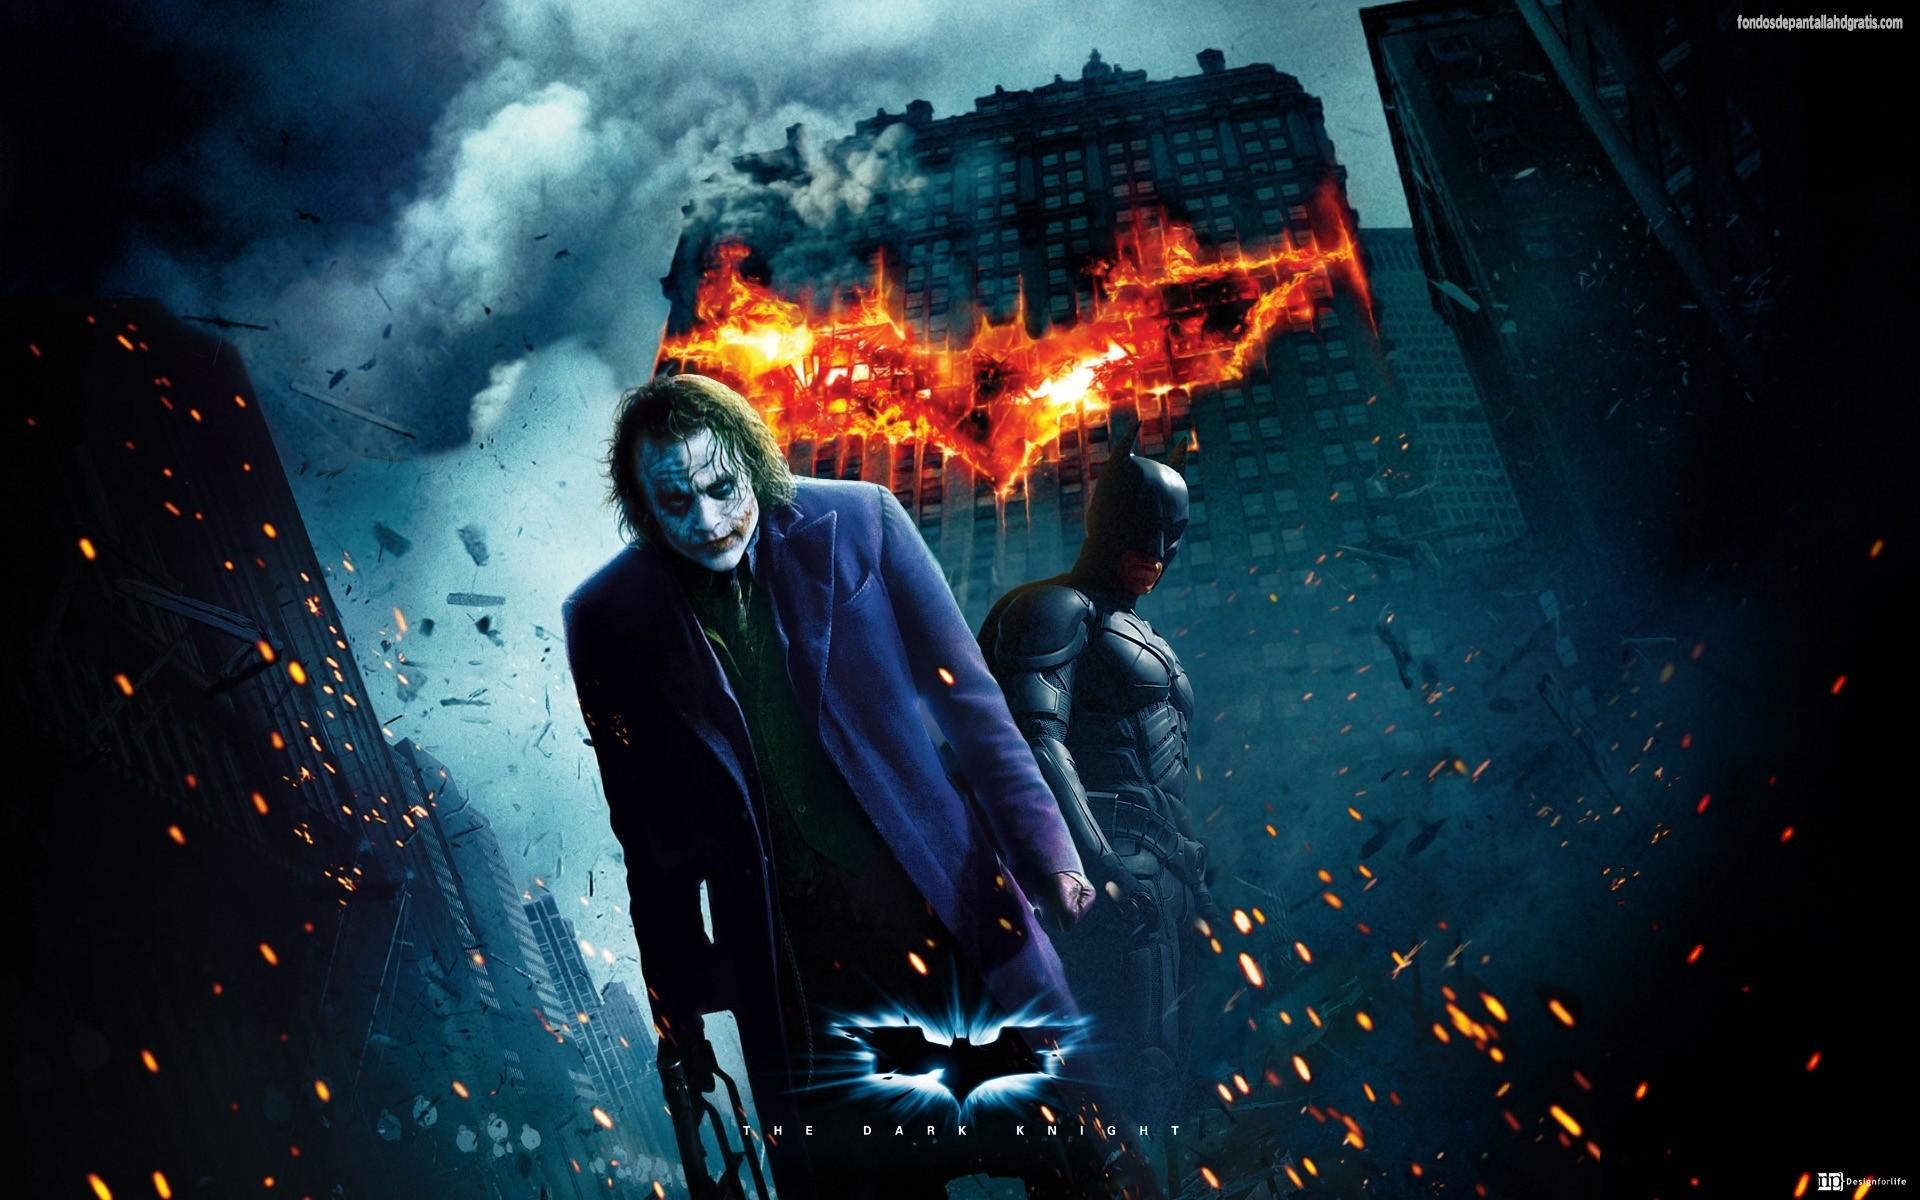 Image – Batman-the-joker-3d-batman-the-dark-knight-hd-wallpapers-12883.jpg  | Villains Wiki | FANDOM powered by Wikia